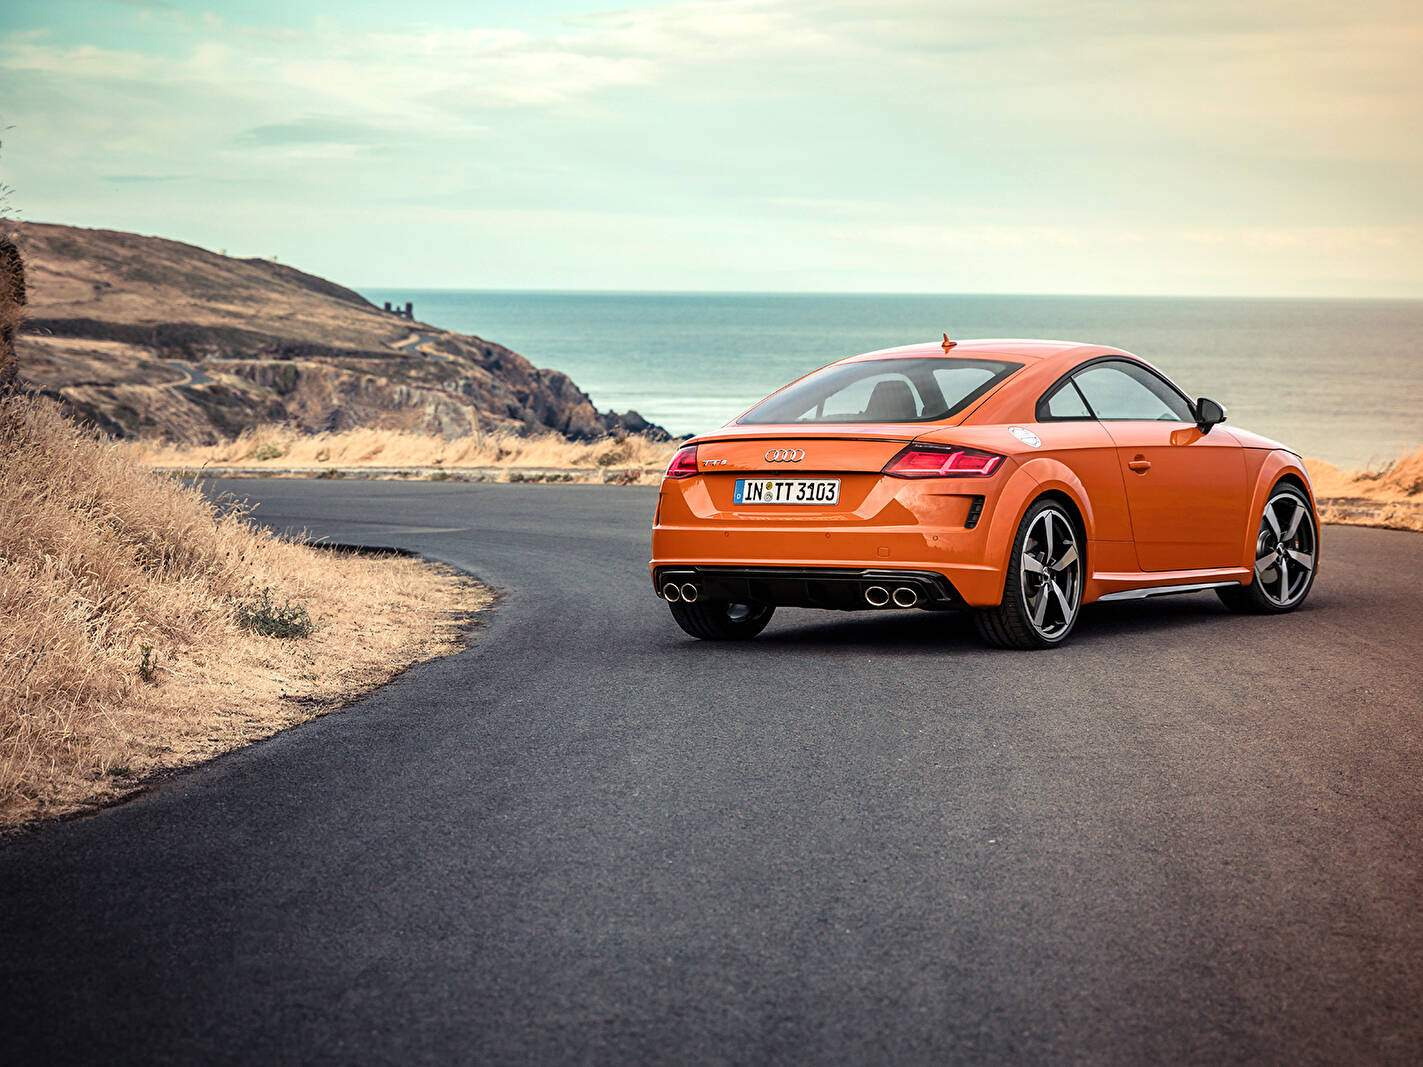 Audi TT S III (2015),  ajouté par fox58